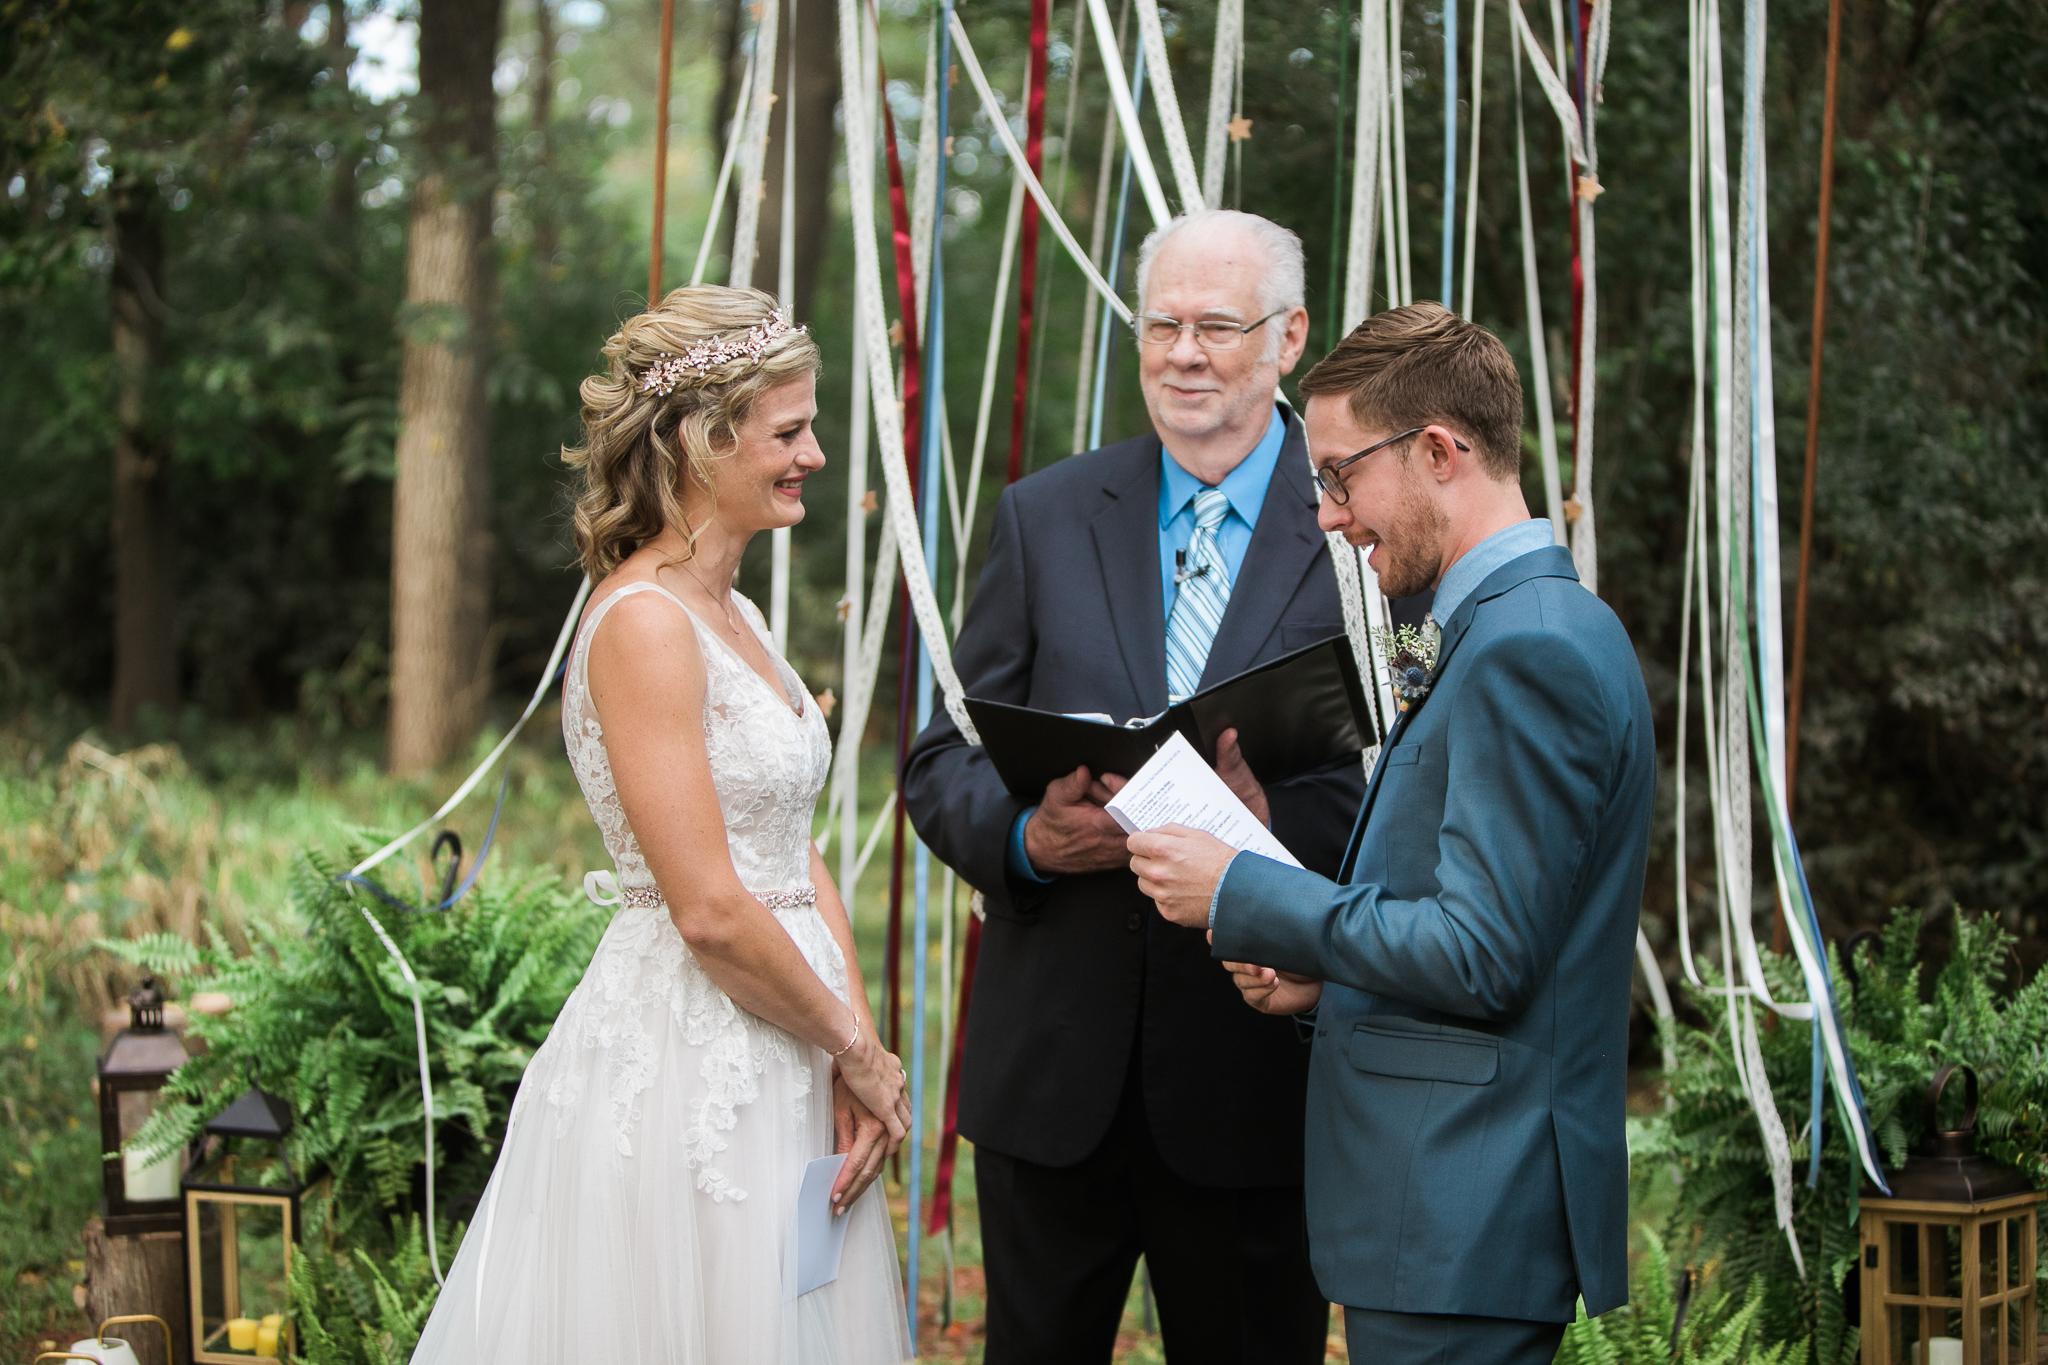 Paoli-Mill-wedding-summer-Wisconsin_103.jpg